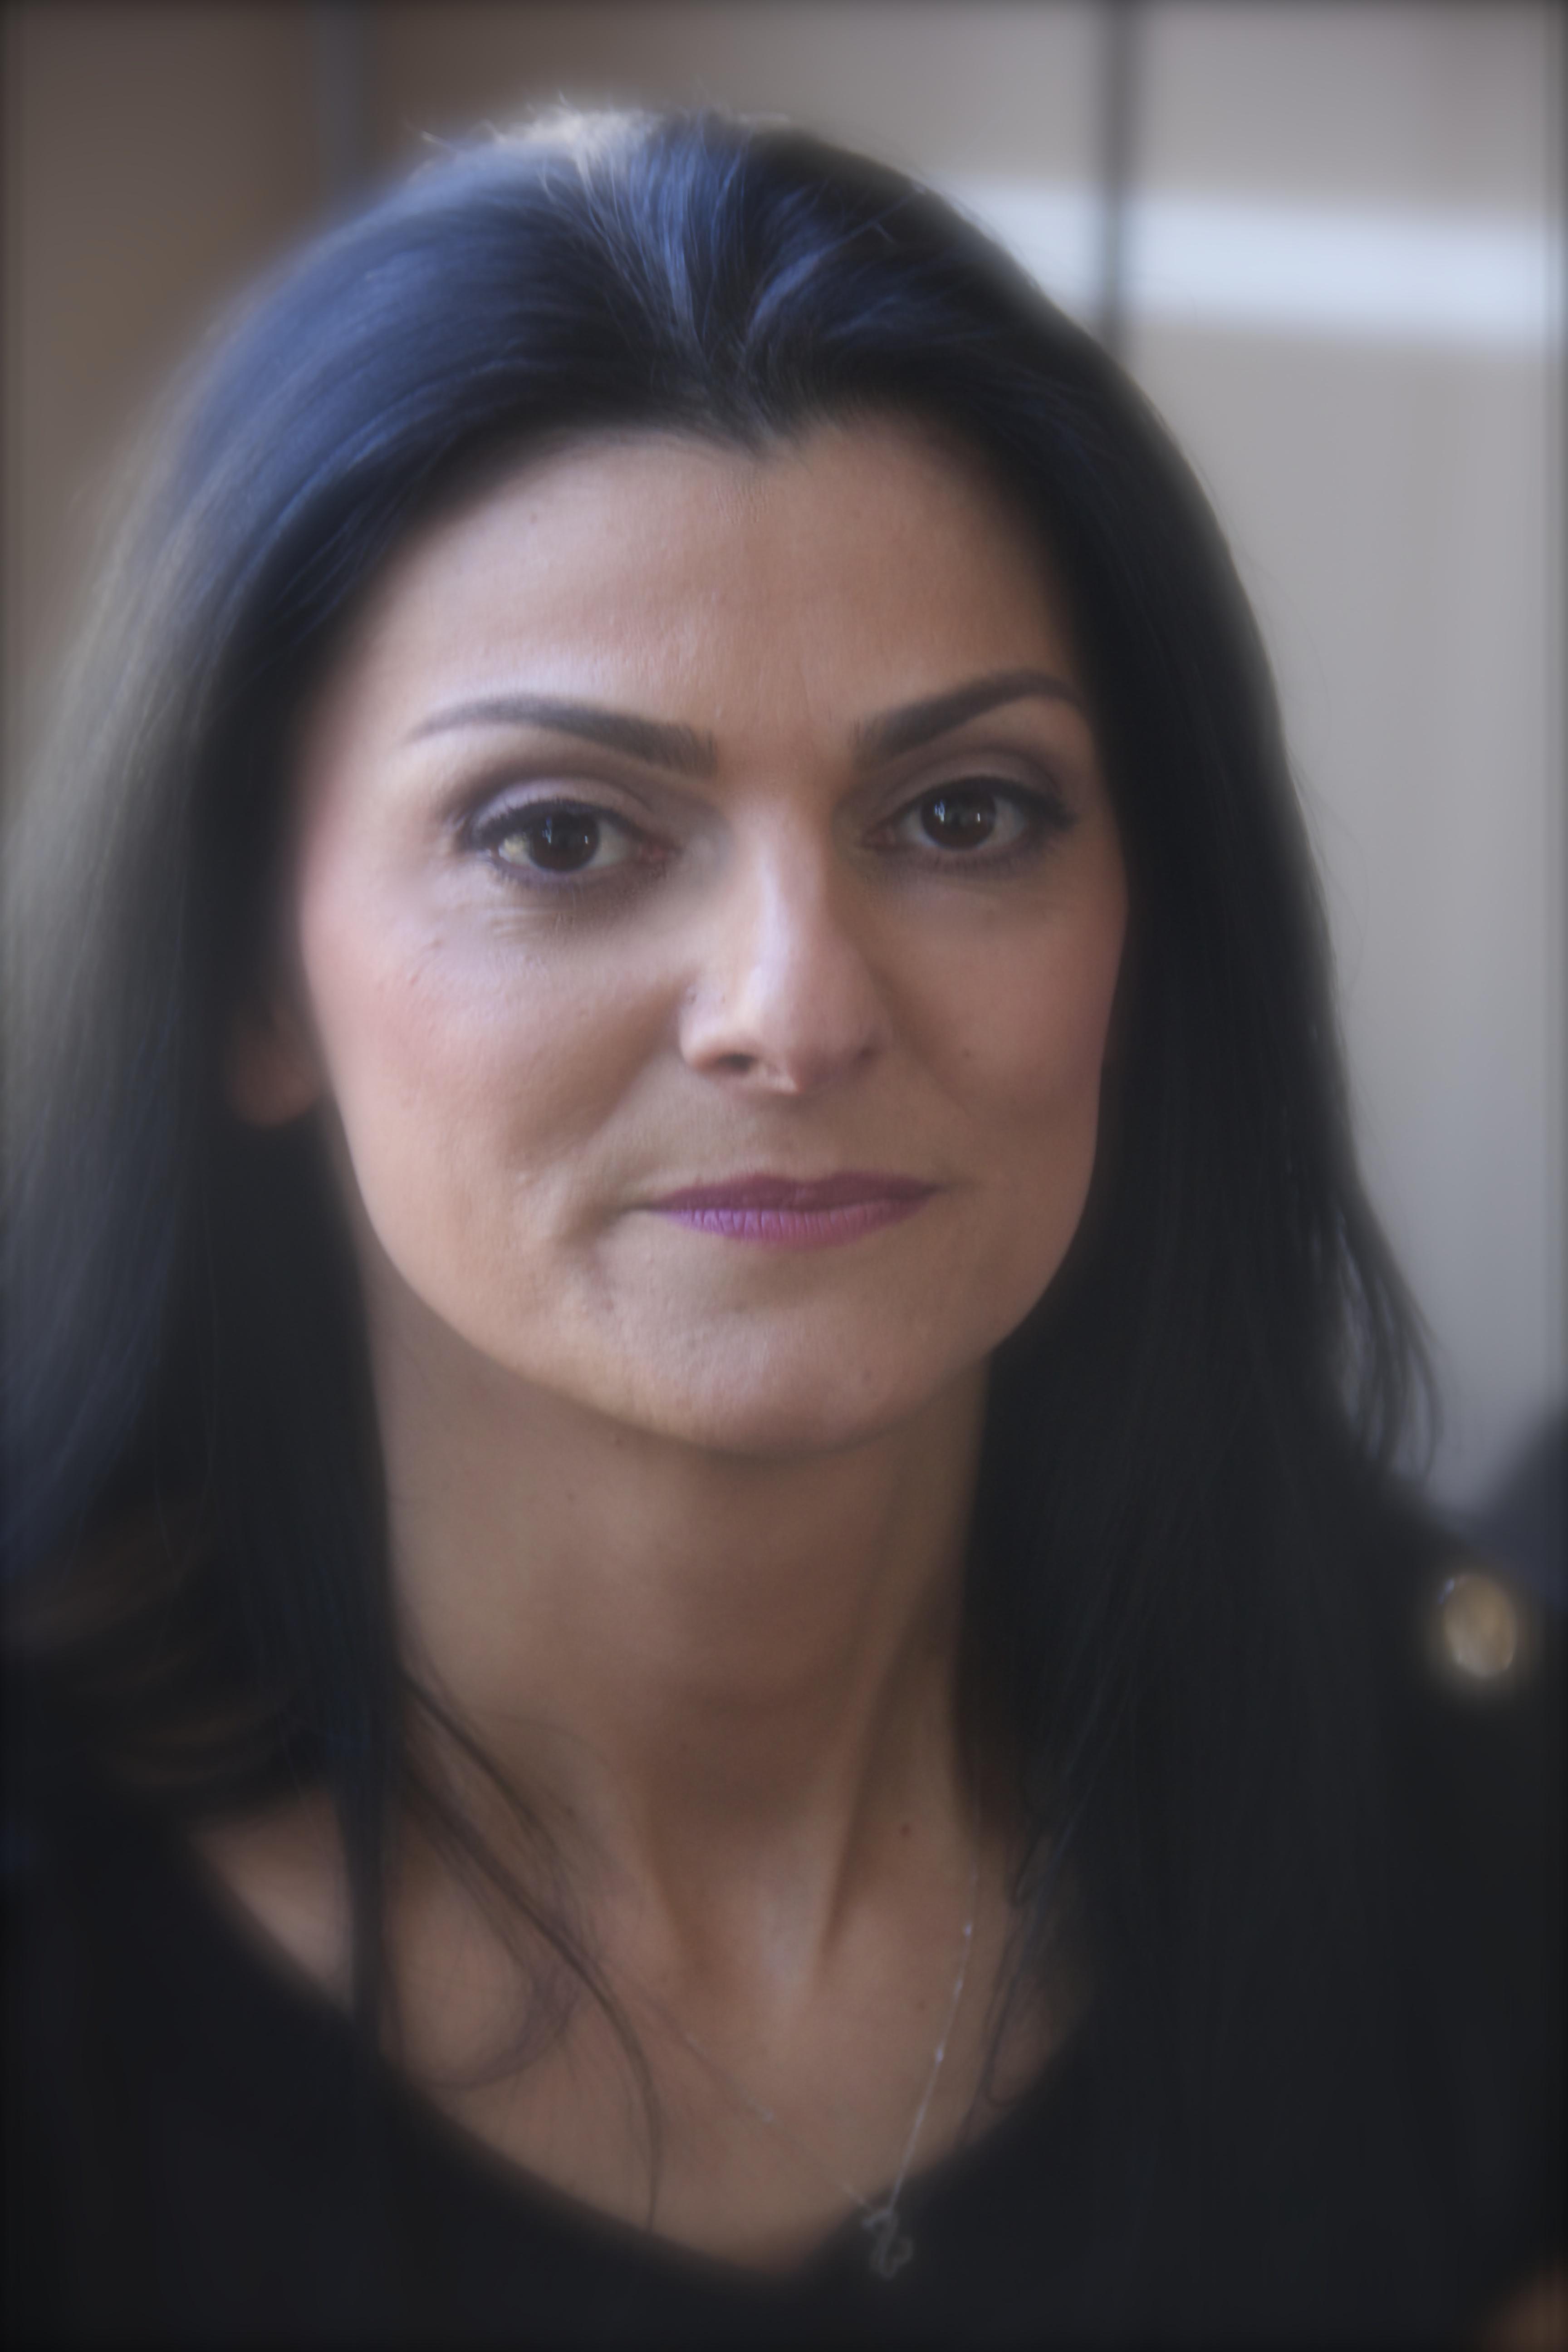 Christine makeup